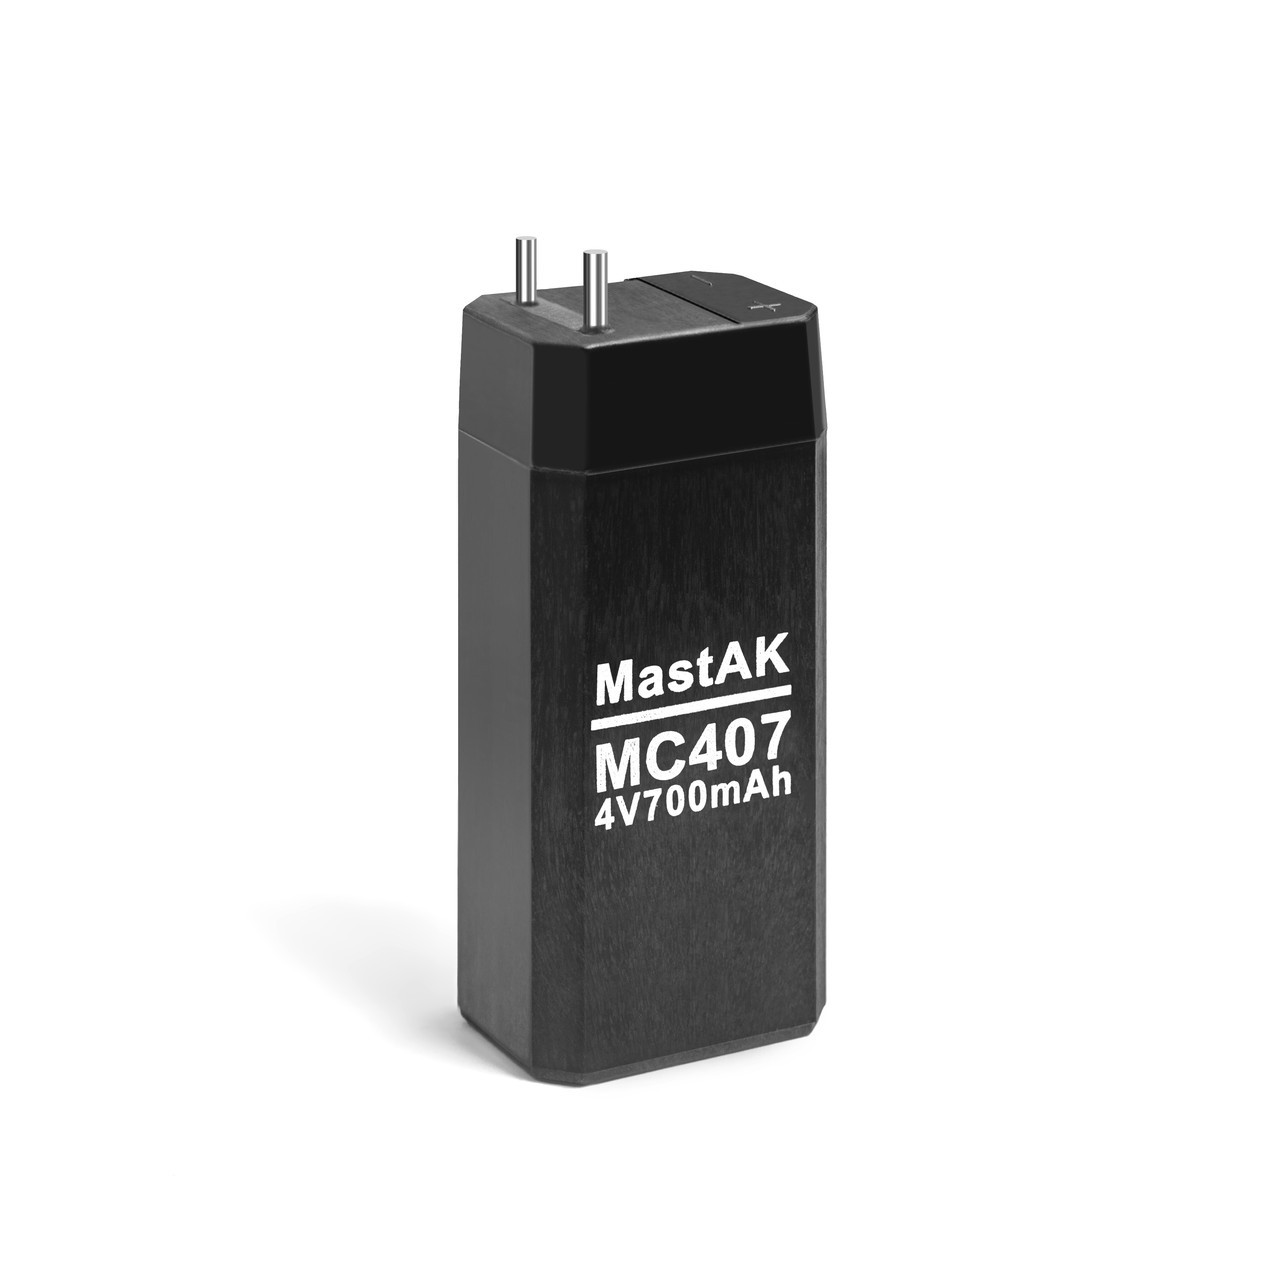 Аккумулятор MC407 MastAK 4V 700mAh